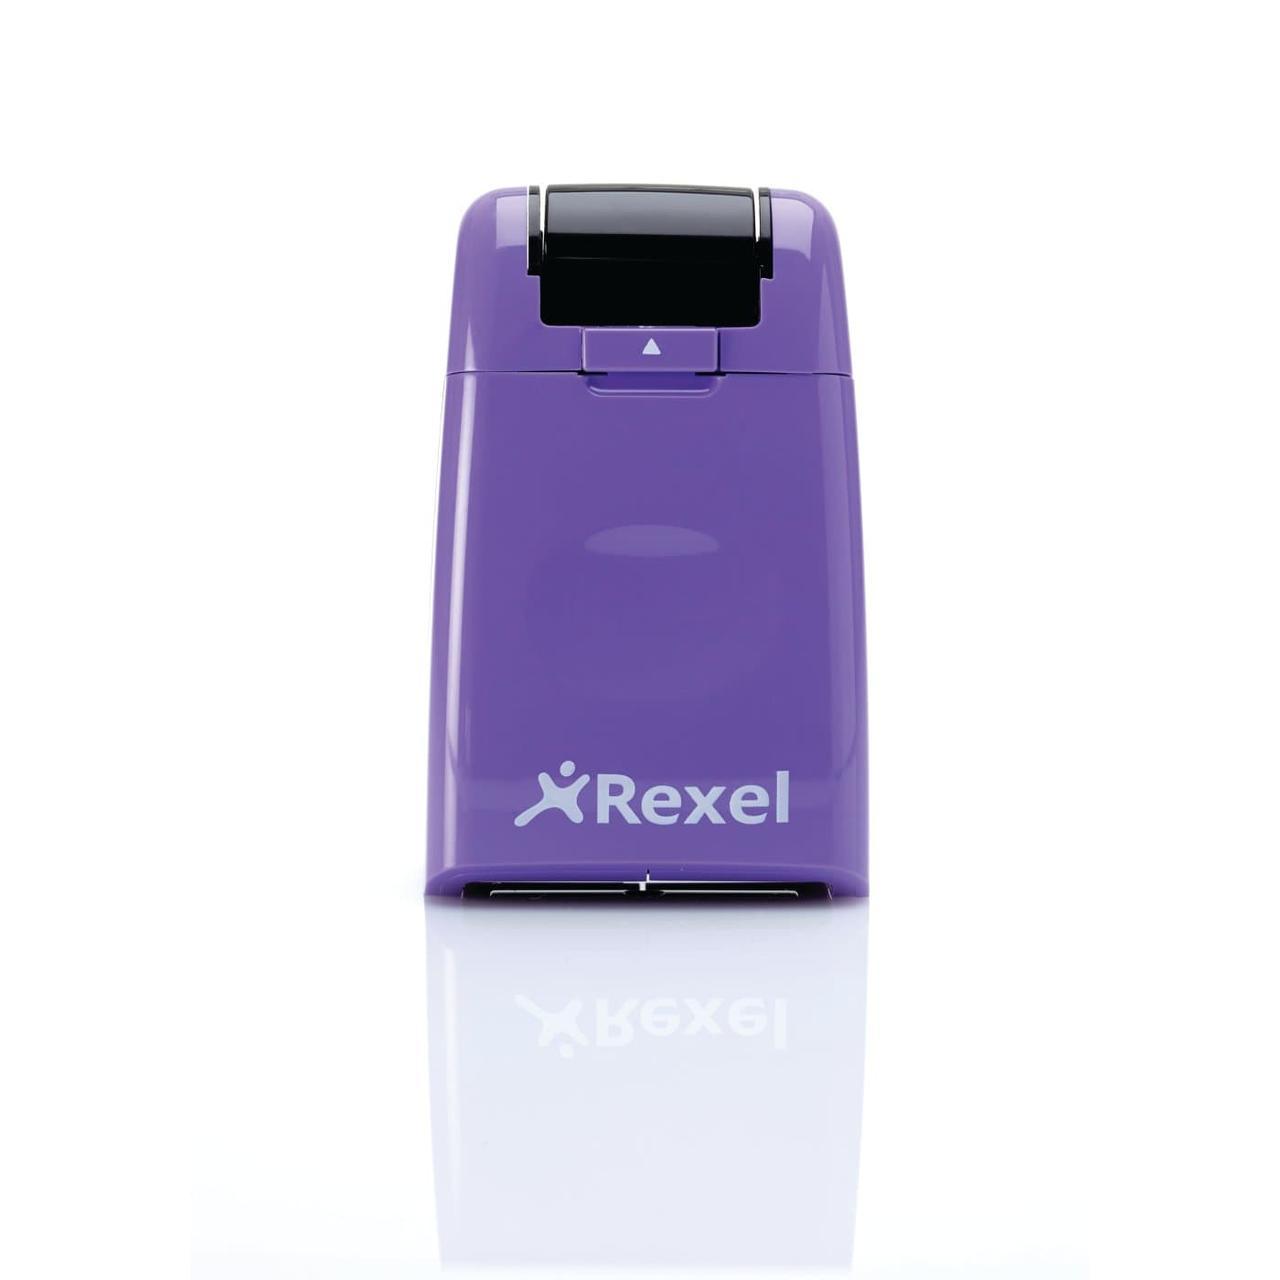 Штамп для скрытия личных данных Rexel ID Guard Roller, фиолетовый (2114007)